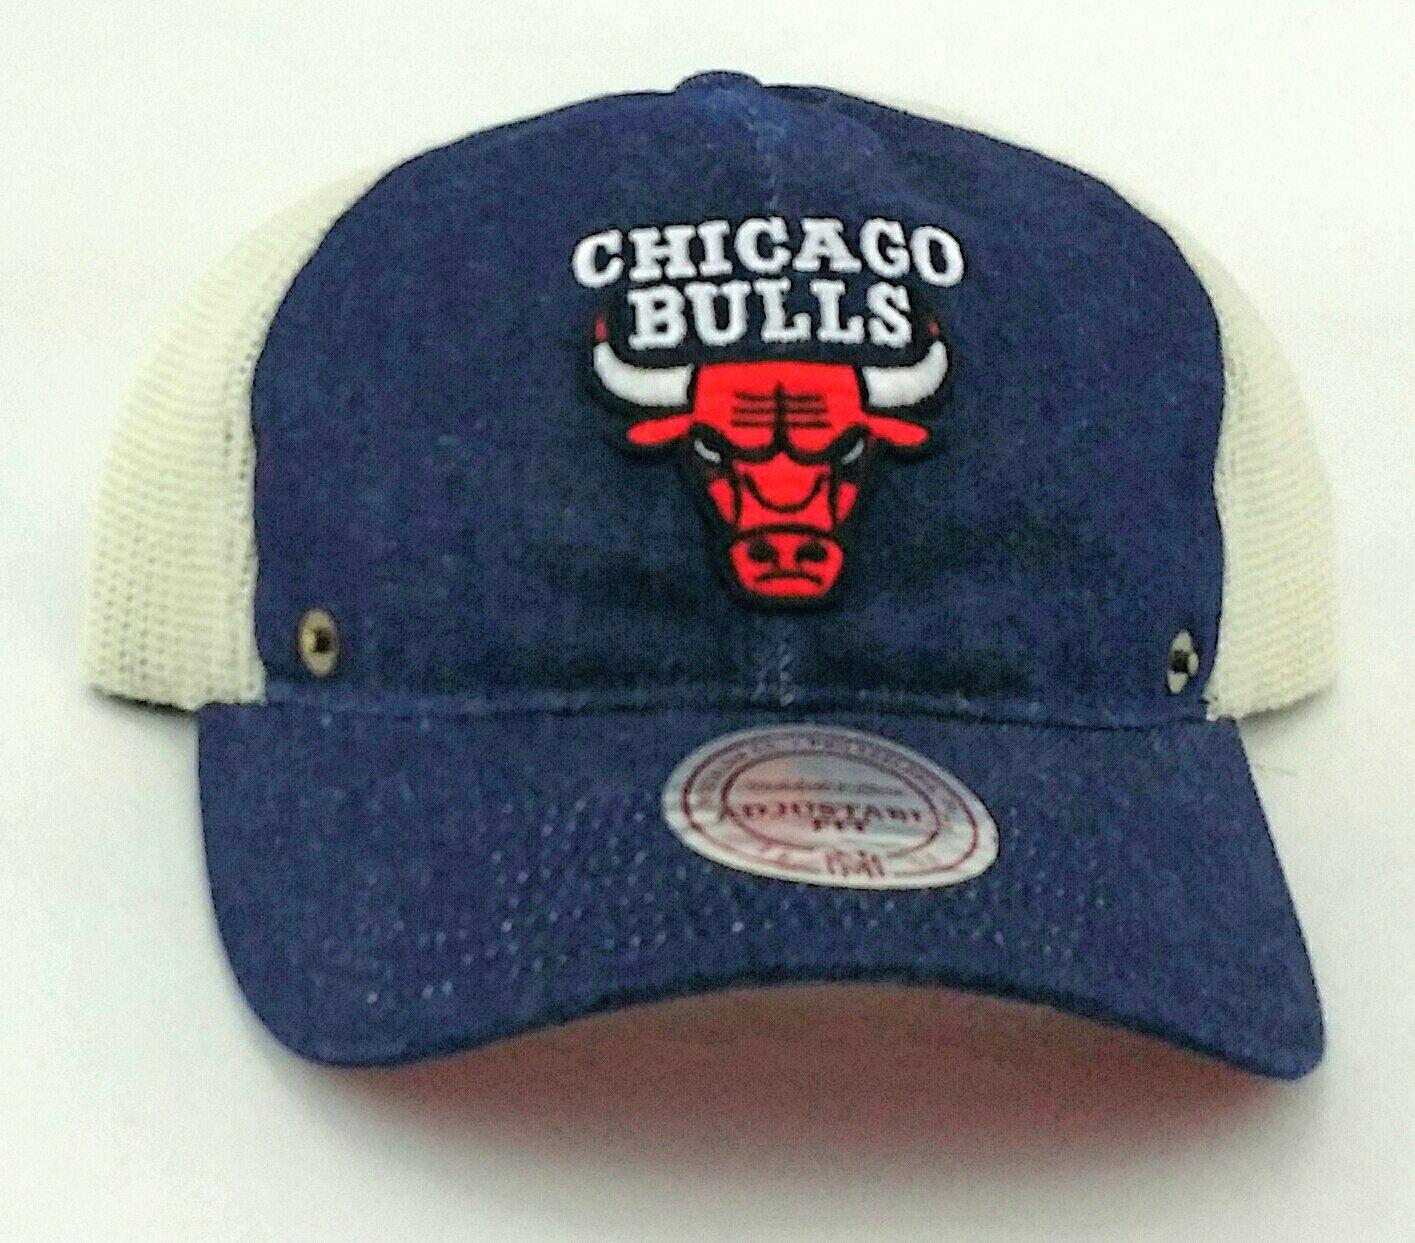 f9108449b5d ... get amazon chicago bulls new mitchell ness denim blue mesh trucker dad  era snapback hat cap